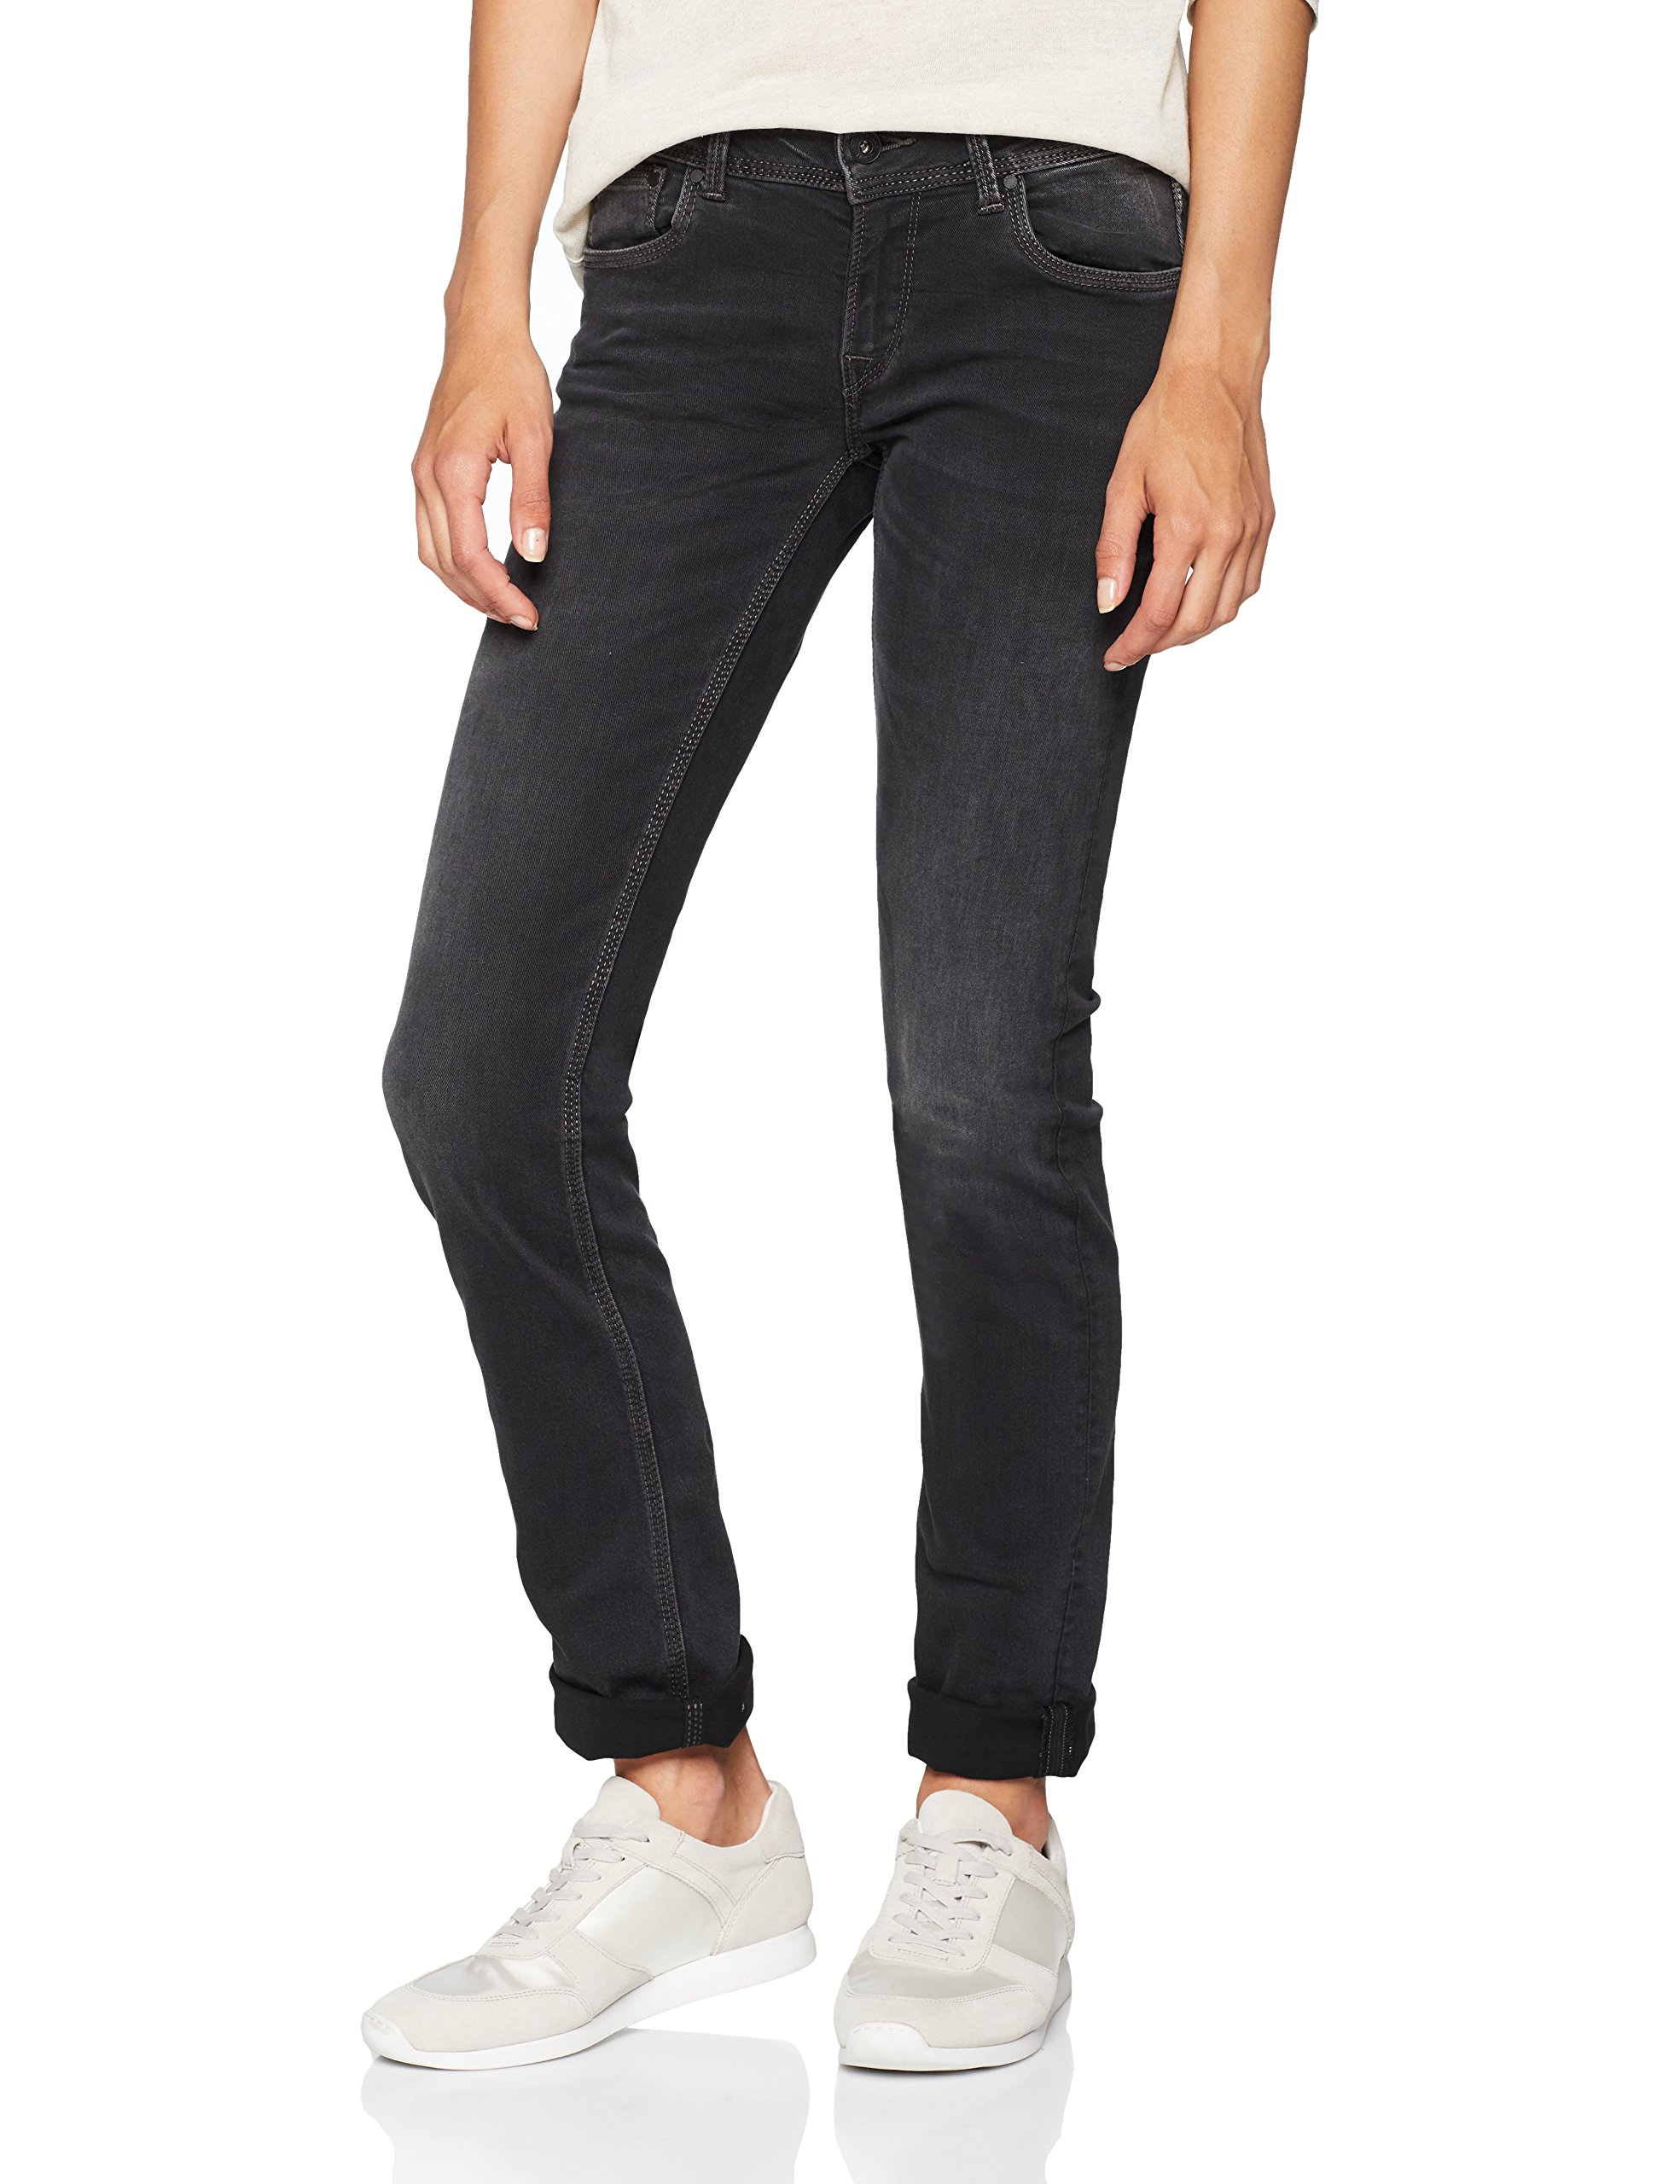 Wb9Taille Jean Pepe Fabricant30 Droit Noirdenim Femme Saturn Jeans 32 rdtCsQh